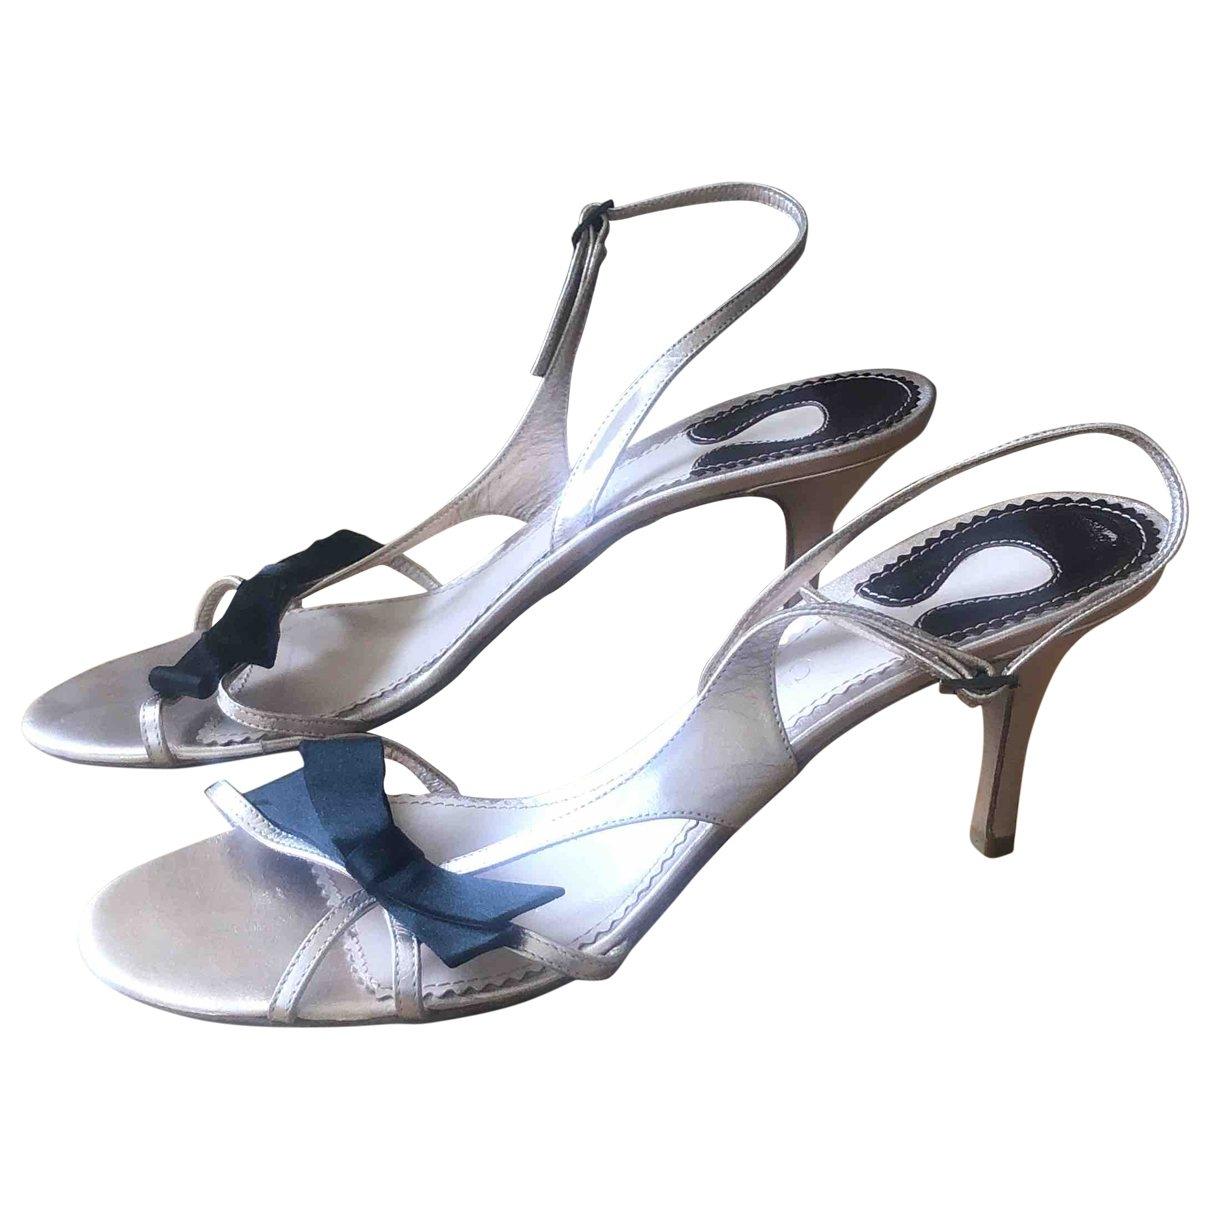 Chloé \N Leather Sandals for Women 39.5 EU